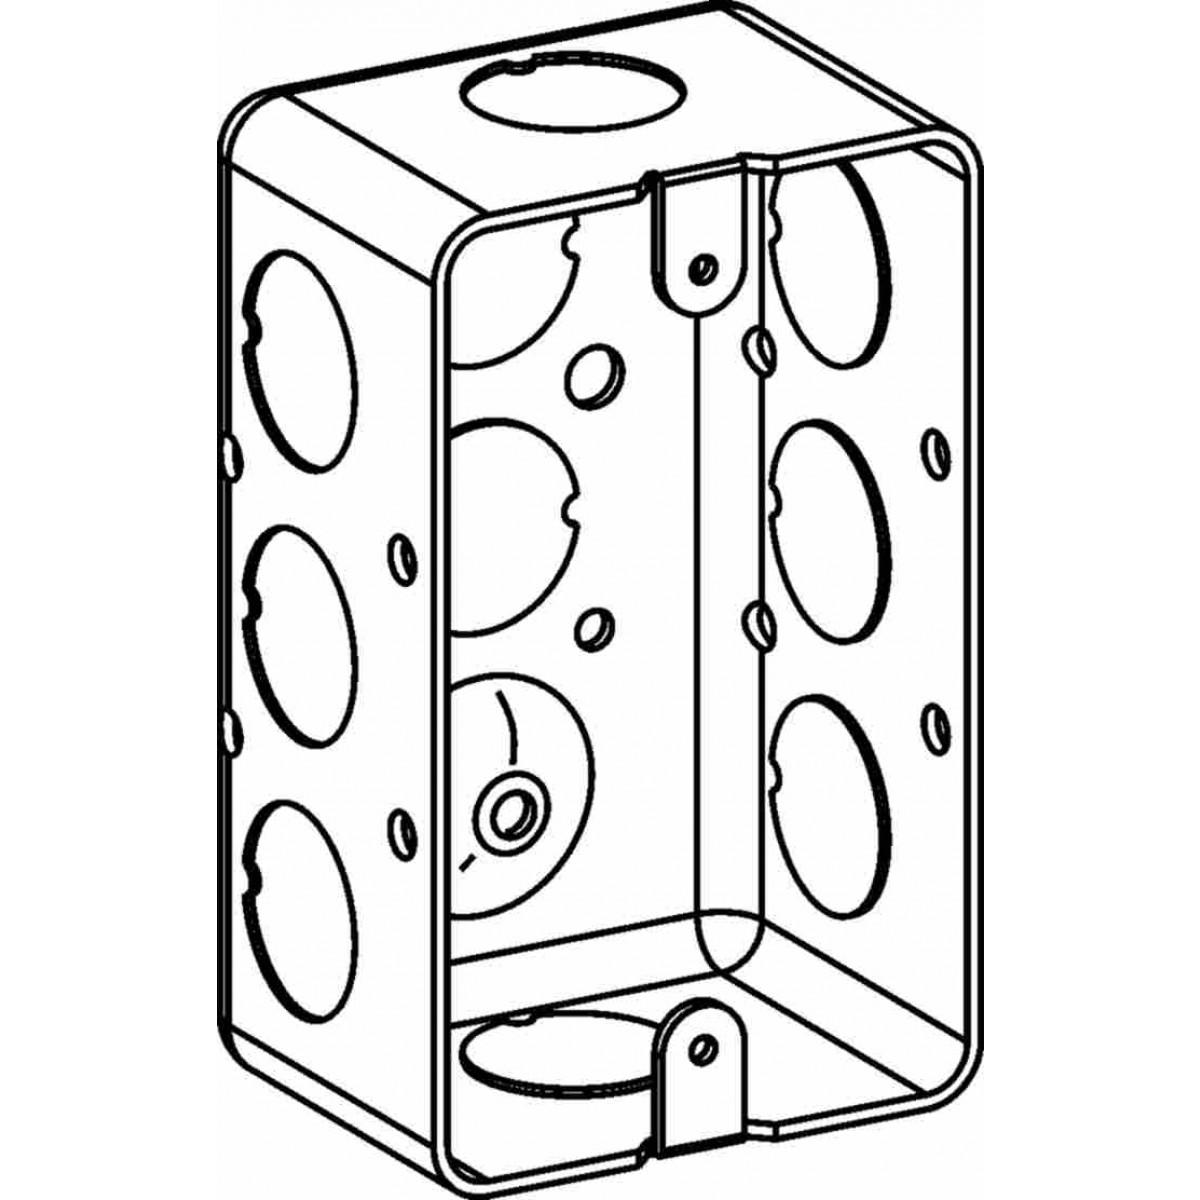 Cantex Pvc Type Fsc Outlet Box Cableorganizer